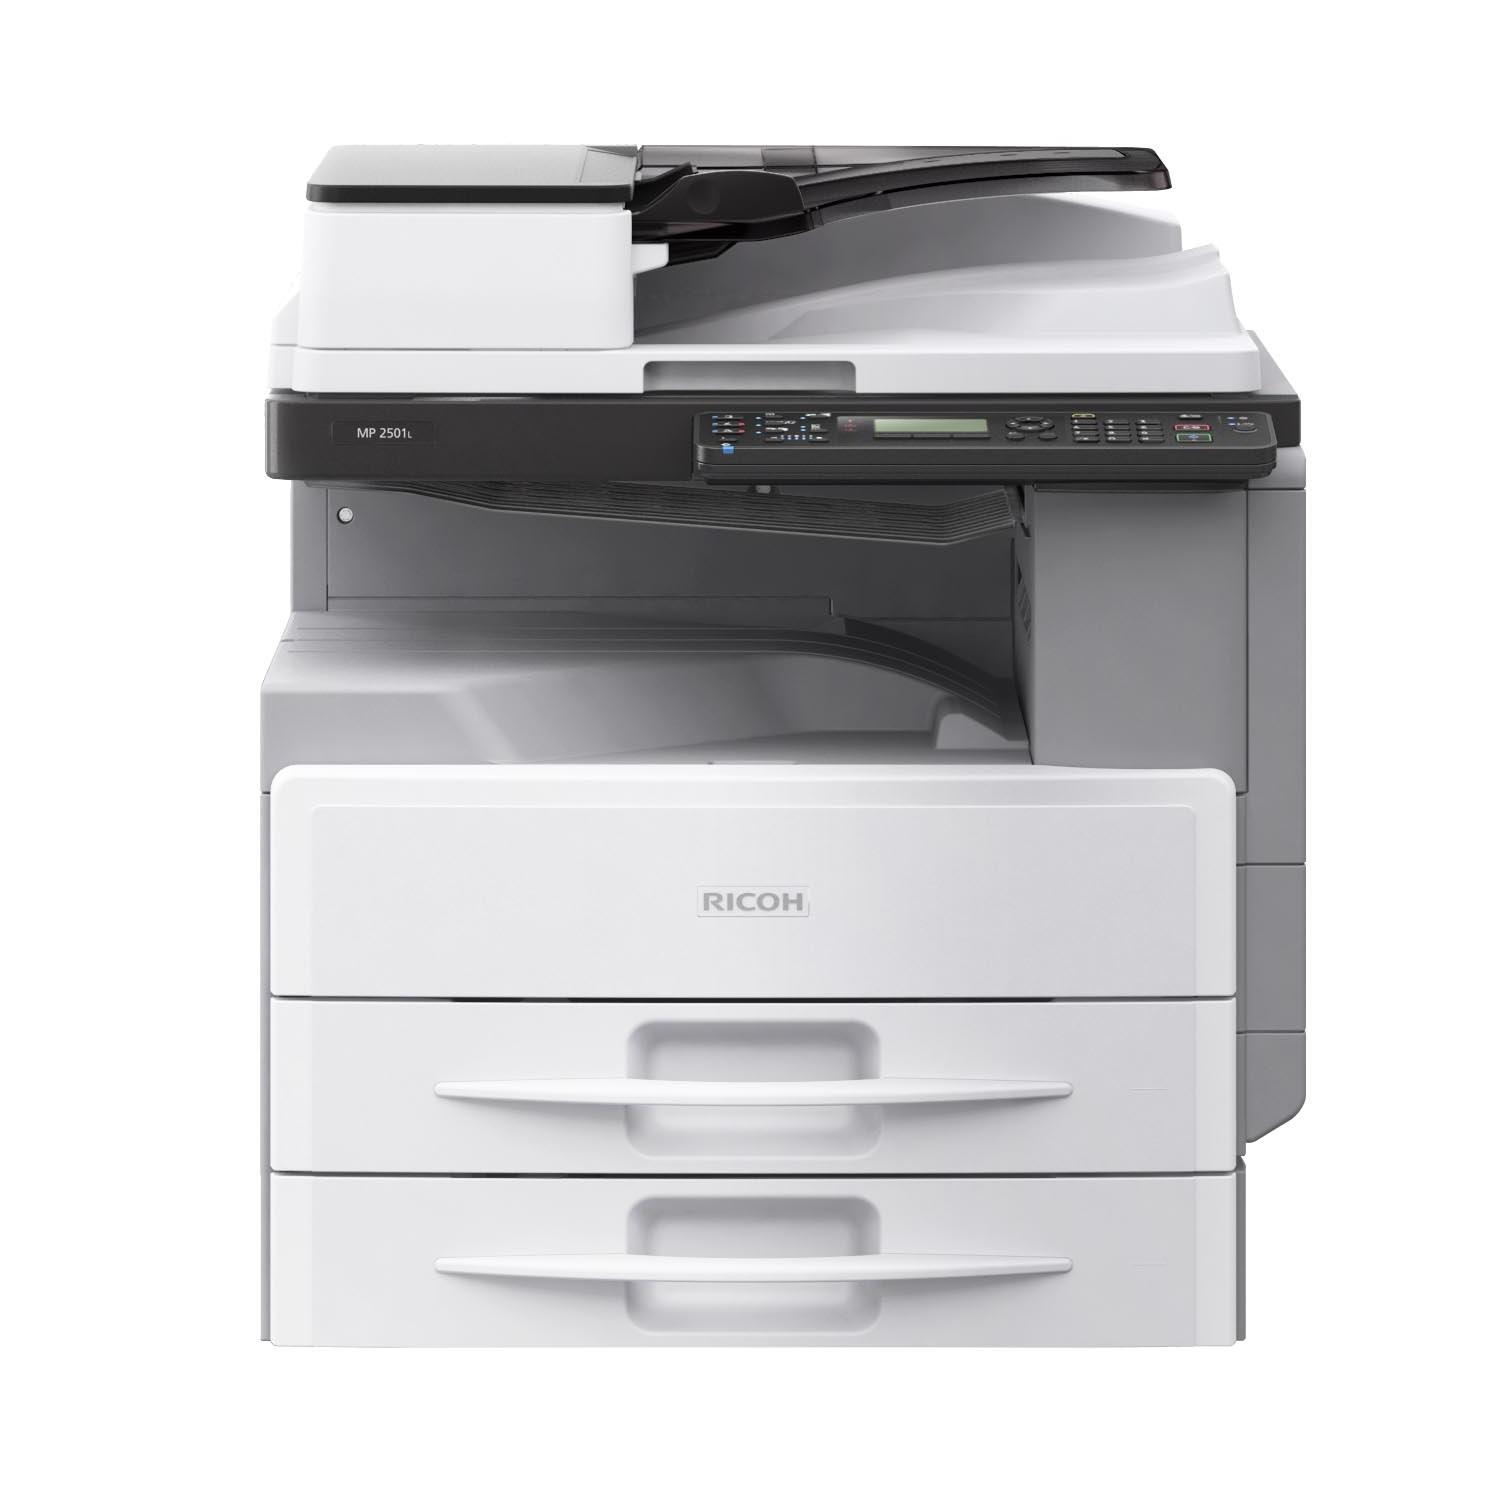 Máy photocopy Ricoh MP2501L (Copy/ Print/ Scan/DADF/ Duplex)